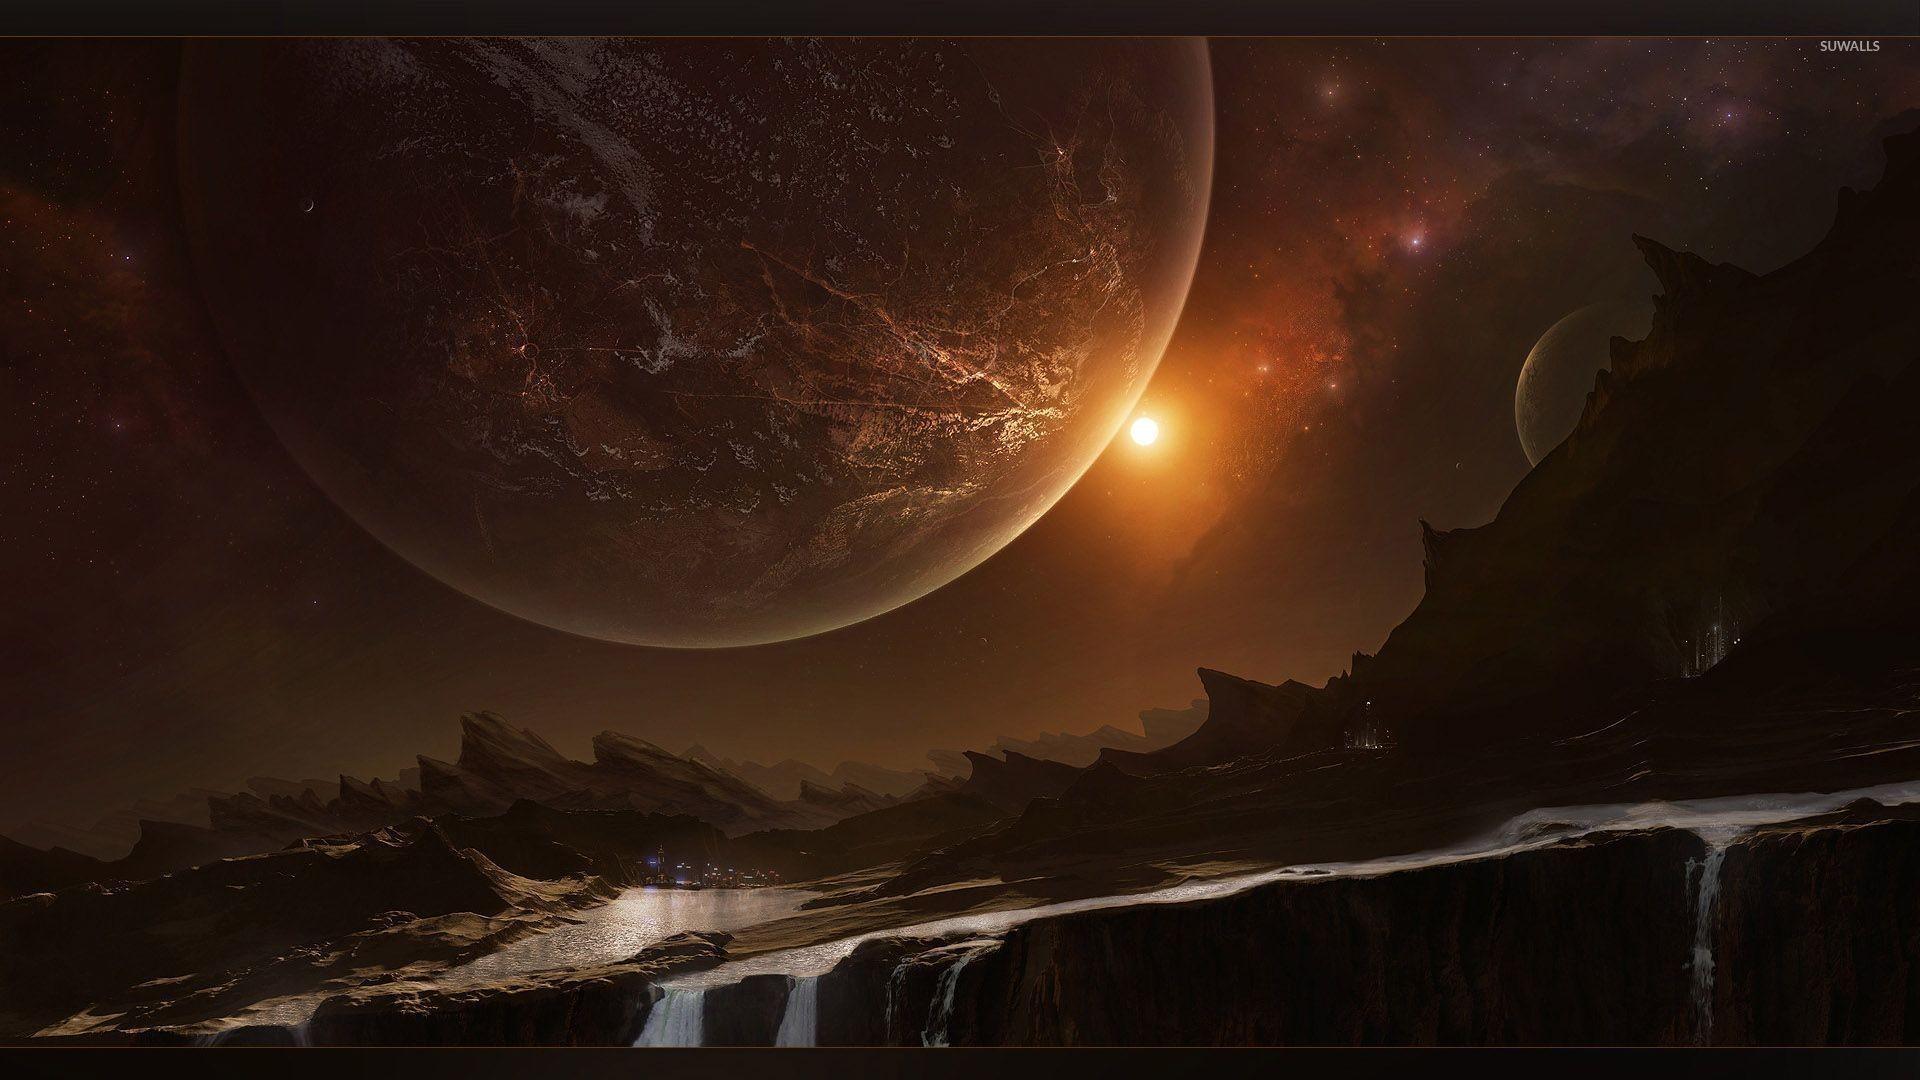 Mountain river on strange planet wallpaper